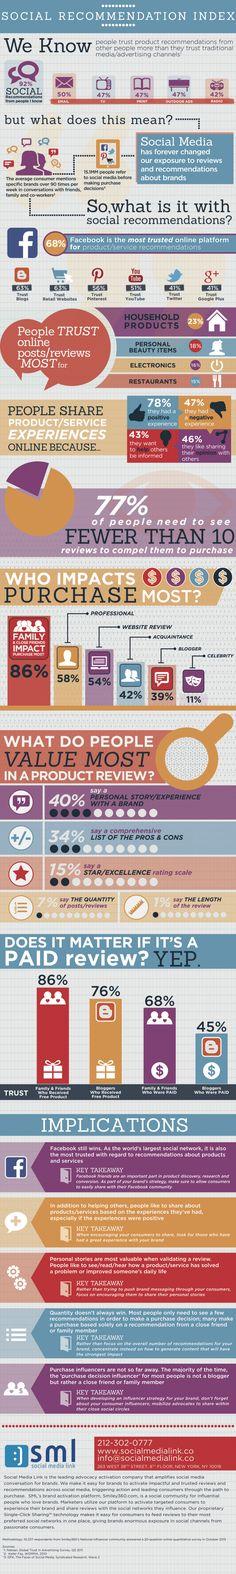 Social media recommendations #infographic #socialmedia